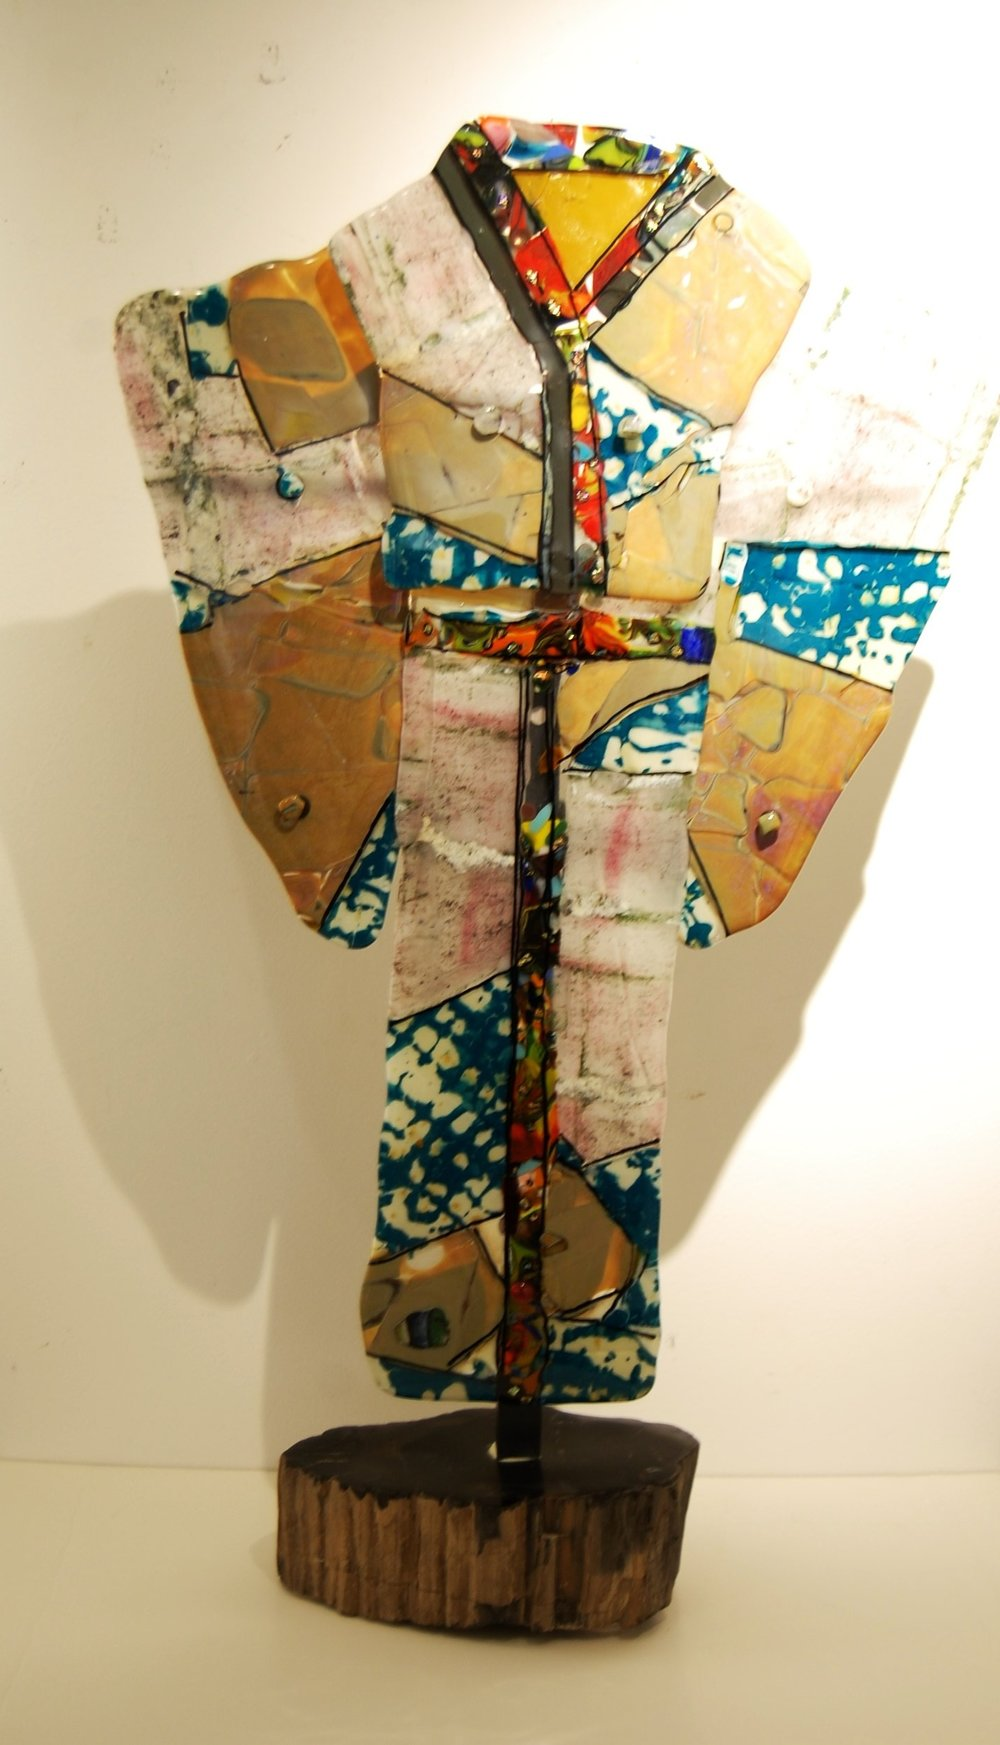 kimono - Alli Luedtke20 x 33 x 8  Fused GlassSee more from this artist